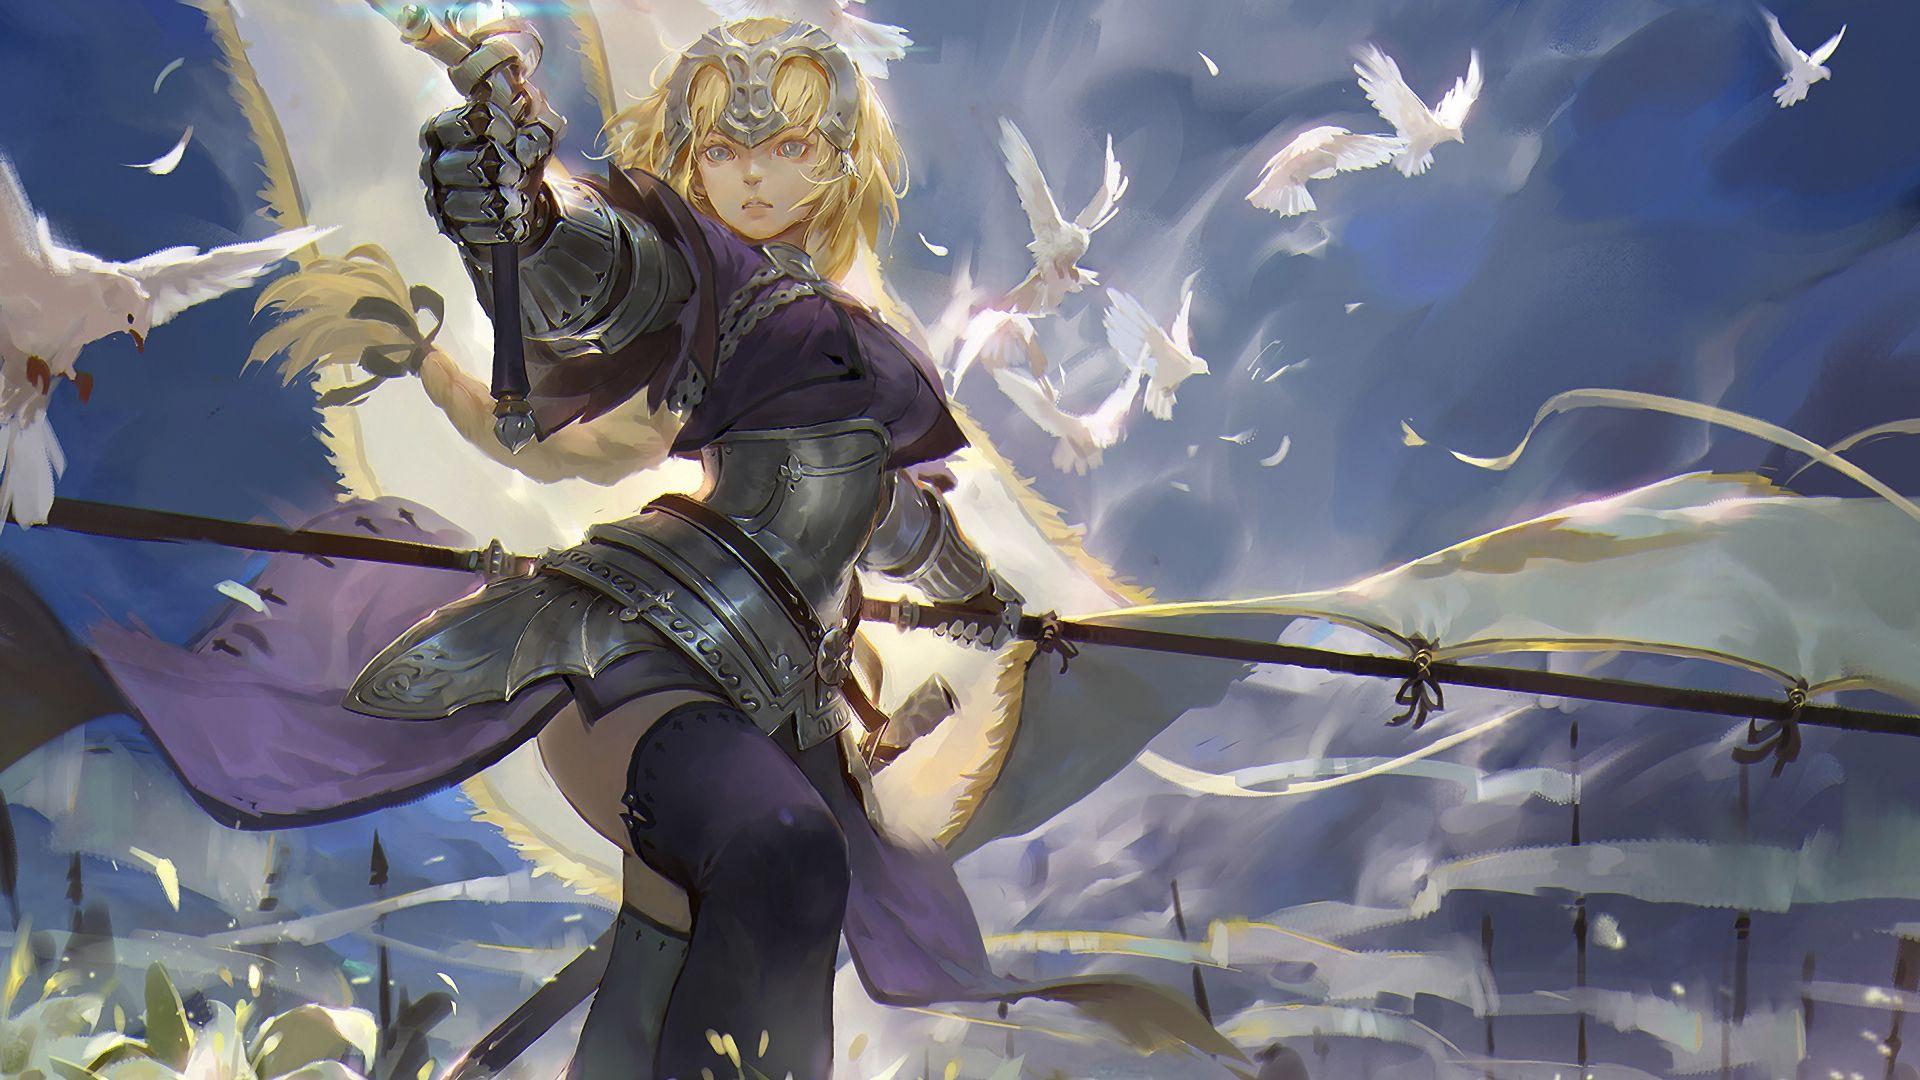 Desktop Wallpaper Anime Girl Blonde Ruler Fate Apocrypha Sword Hd Image Picture Background B8bb2e